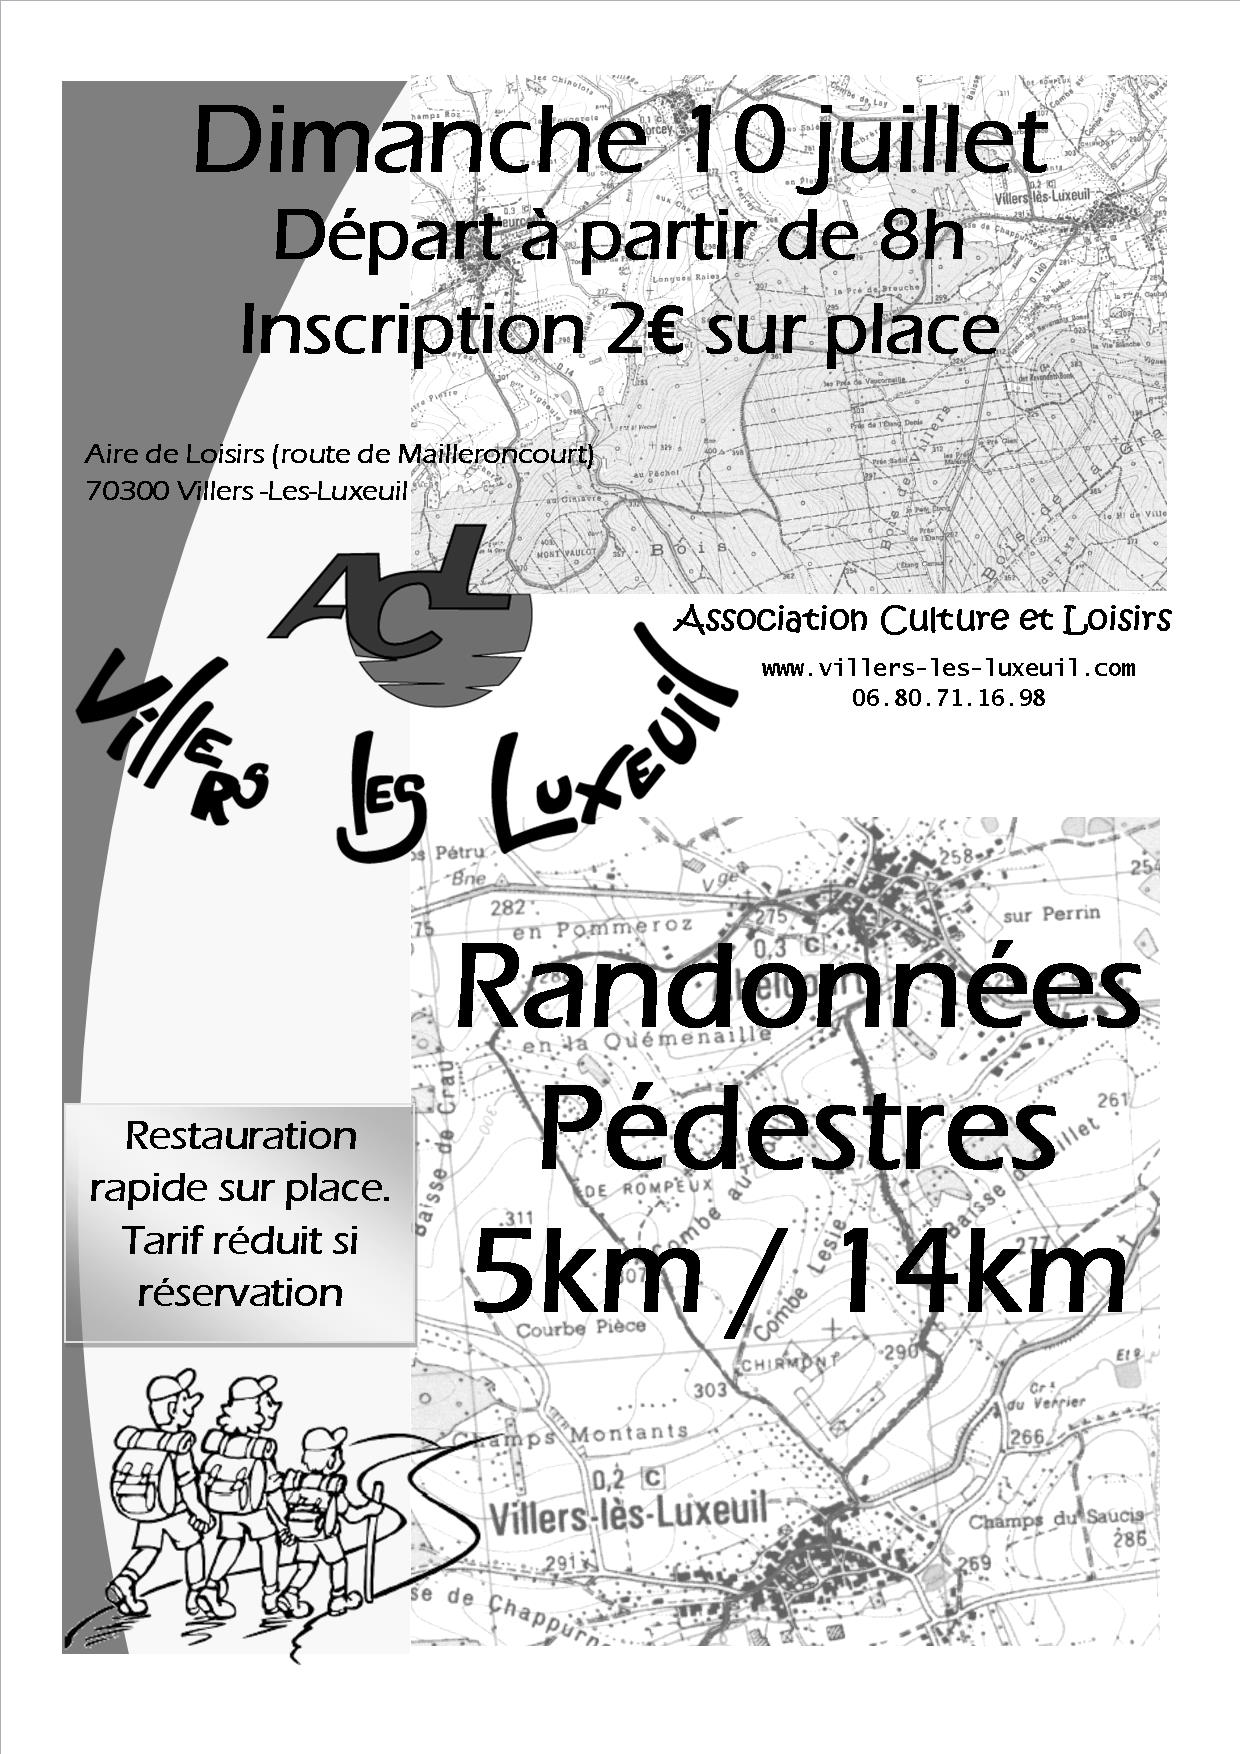 https://www.villers-les-luxeuil.com/projets/villers/files/images/2016_Evenements/Villers_En_Fete/Rando1.jpg